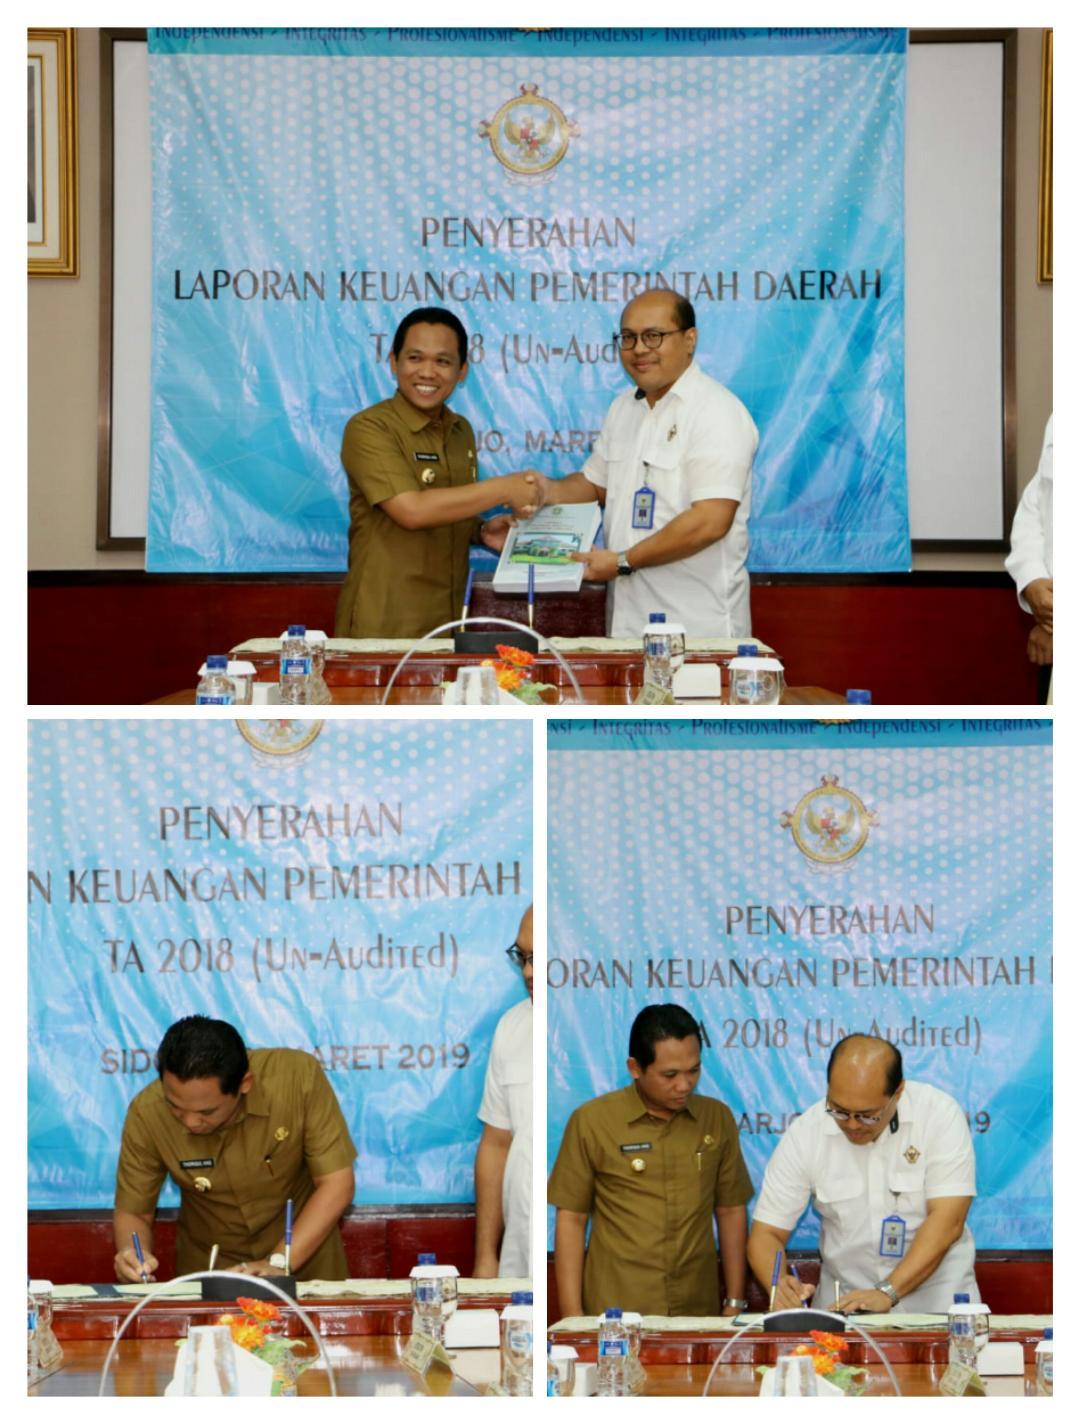 Terkait Keuangan Penilaian BPK Nyatakan Kabupaten Lumajang Cukup Baik Dengan Capaian Di Atas Rata-Rata